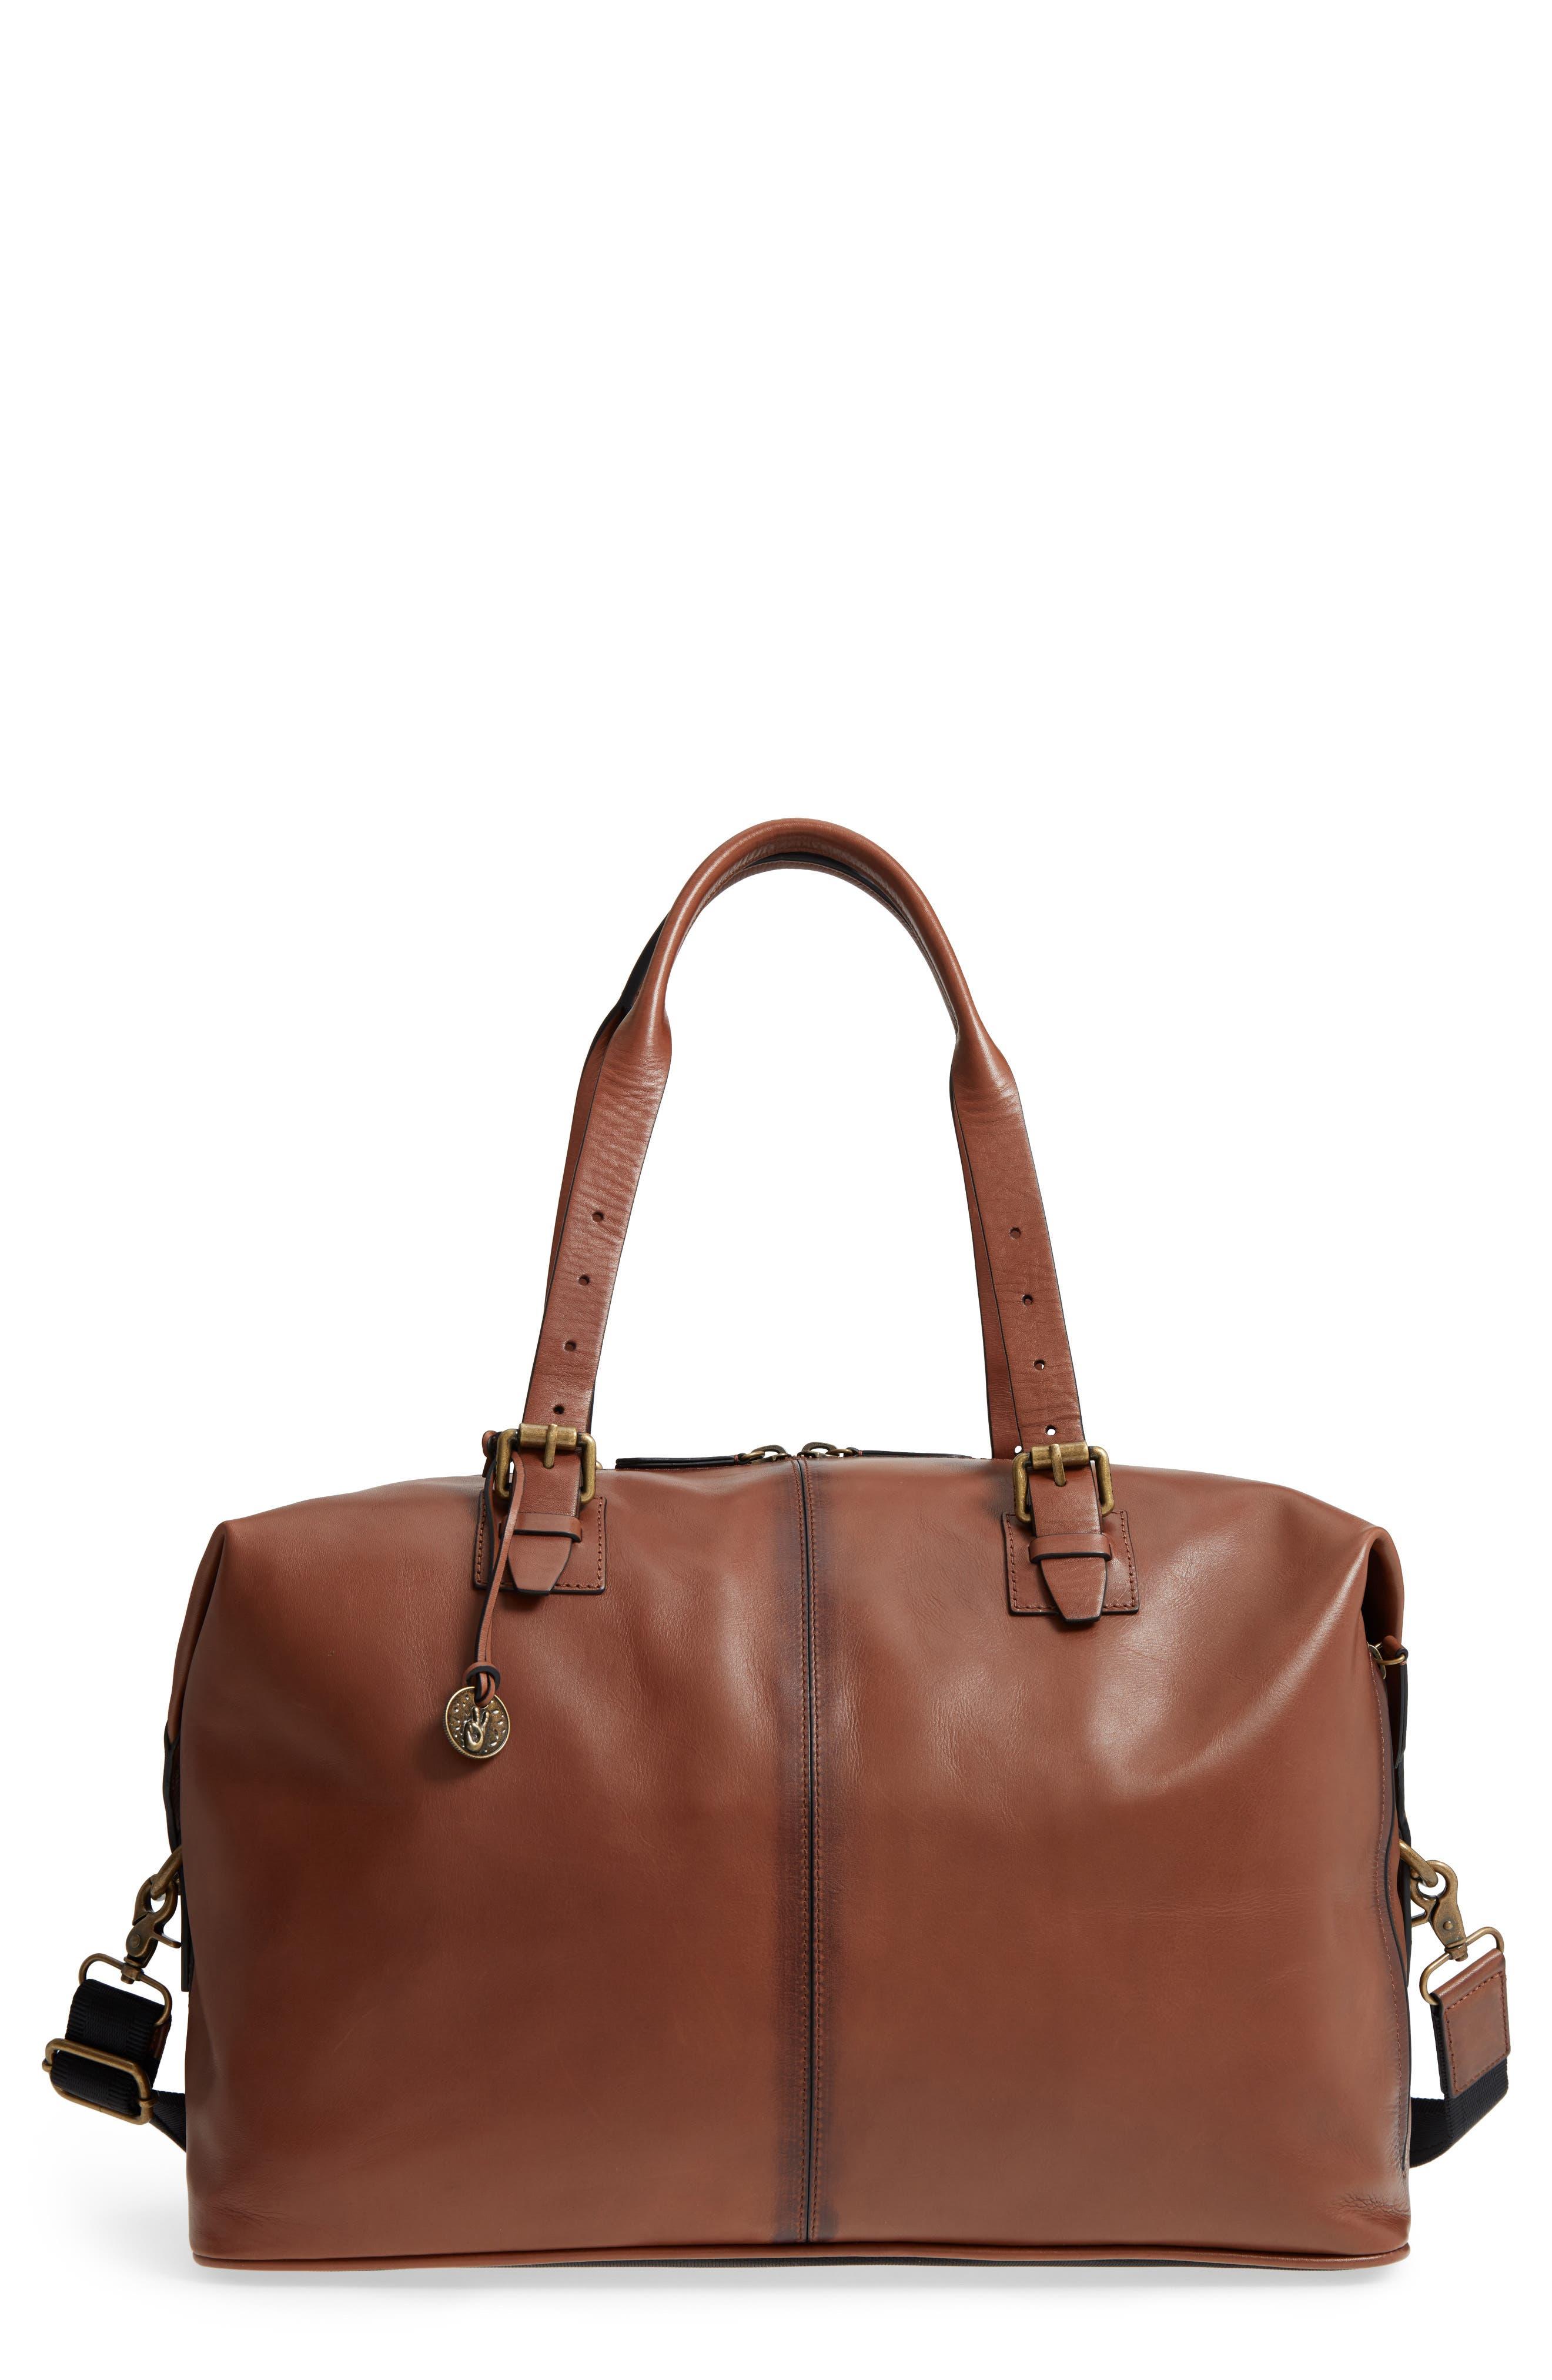 Heritage Leather Duffel Bag,                             Main thumbnail 1, color,                             200